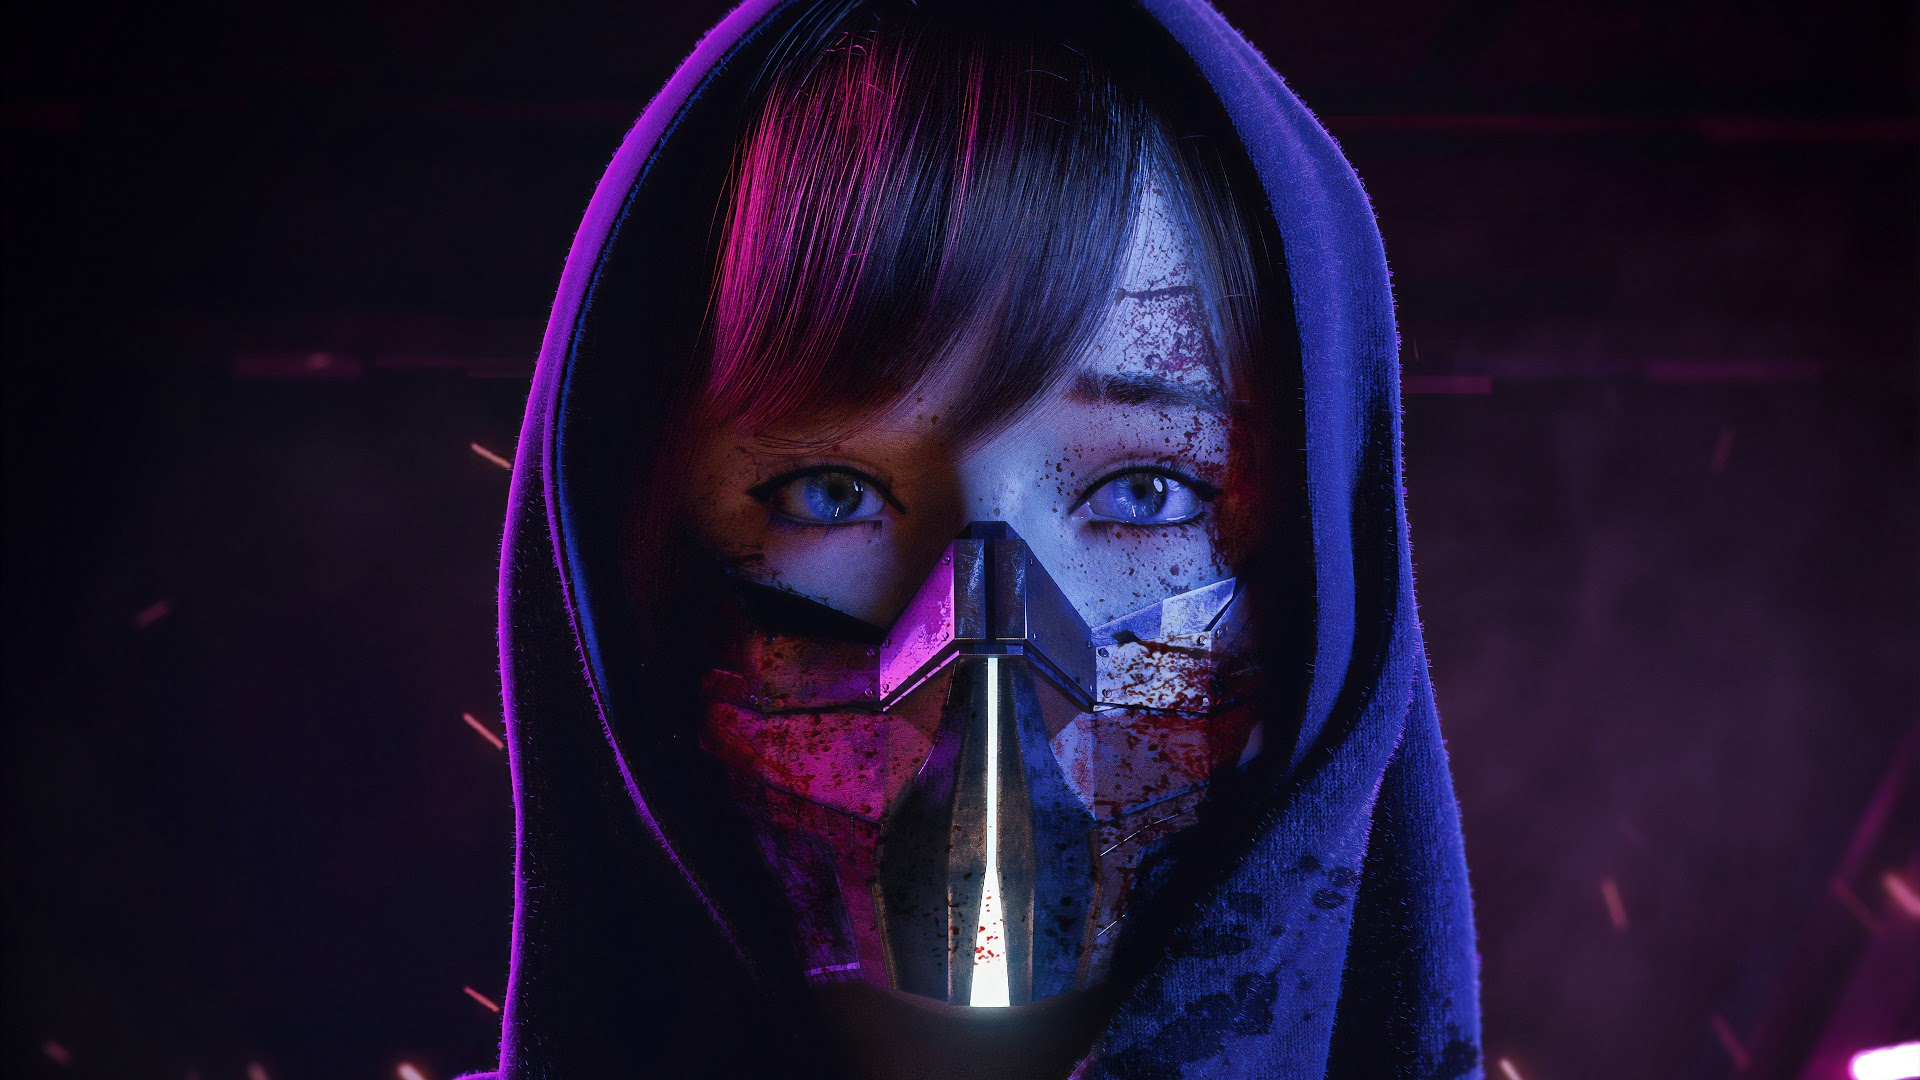 Cyberpunk Mask HD Download